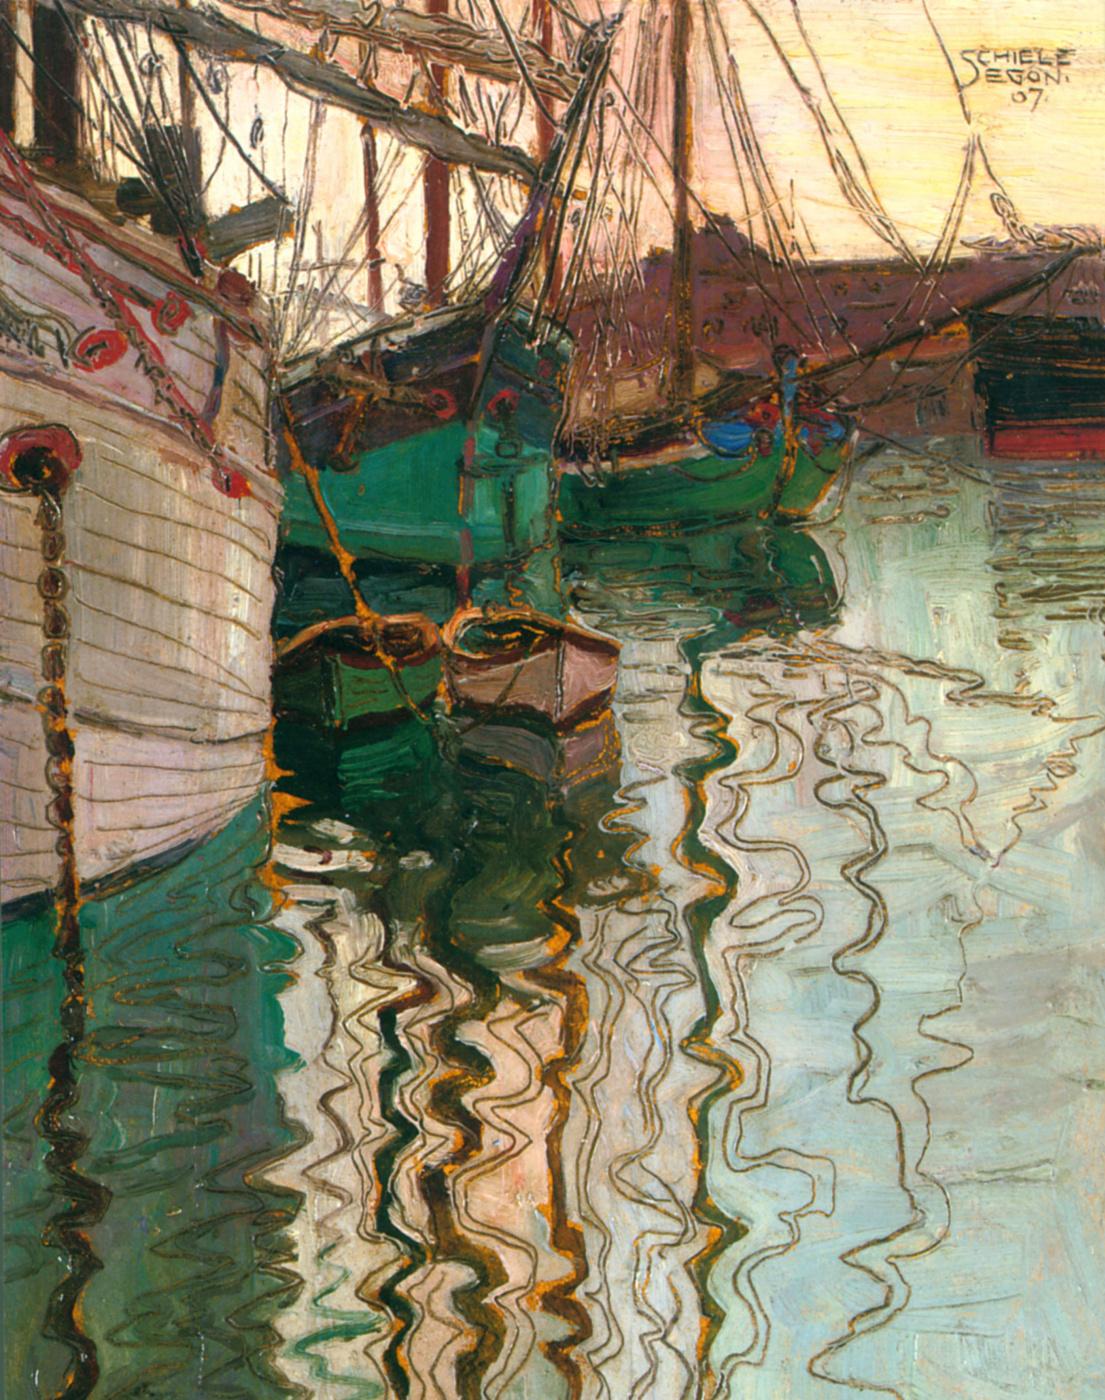 Egon Schiele. The Harbor in Trieste